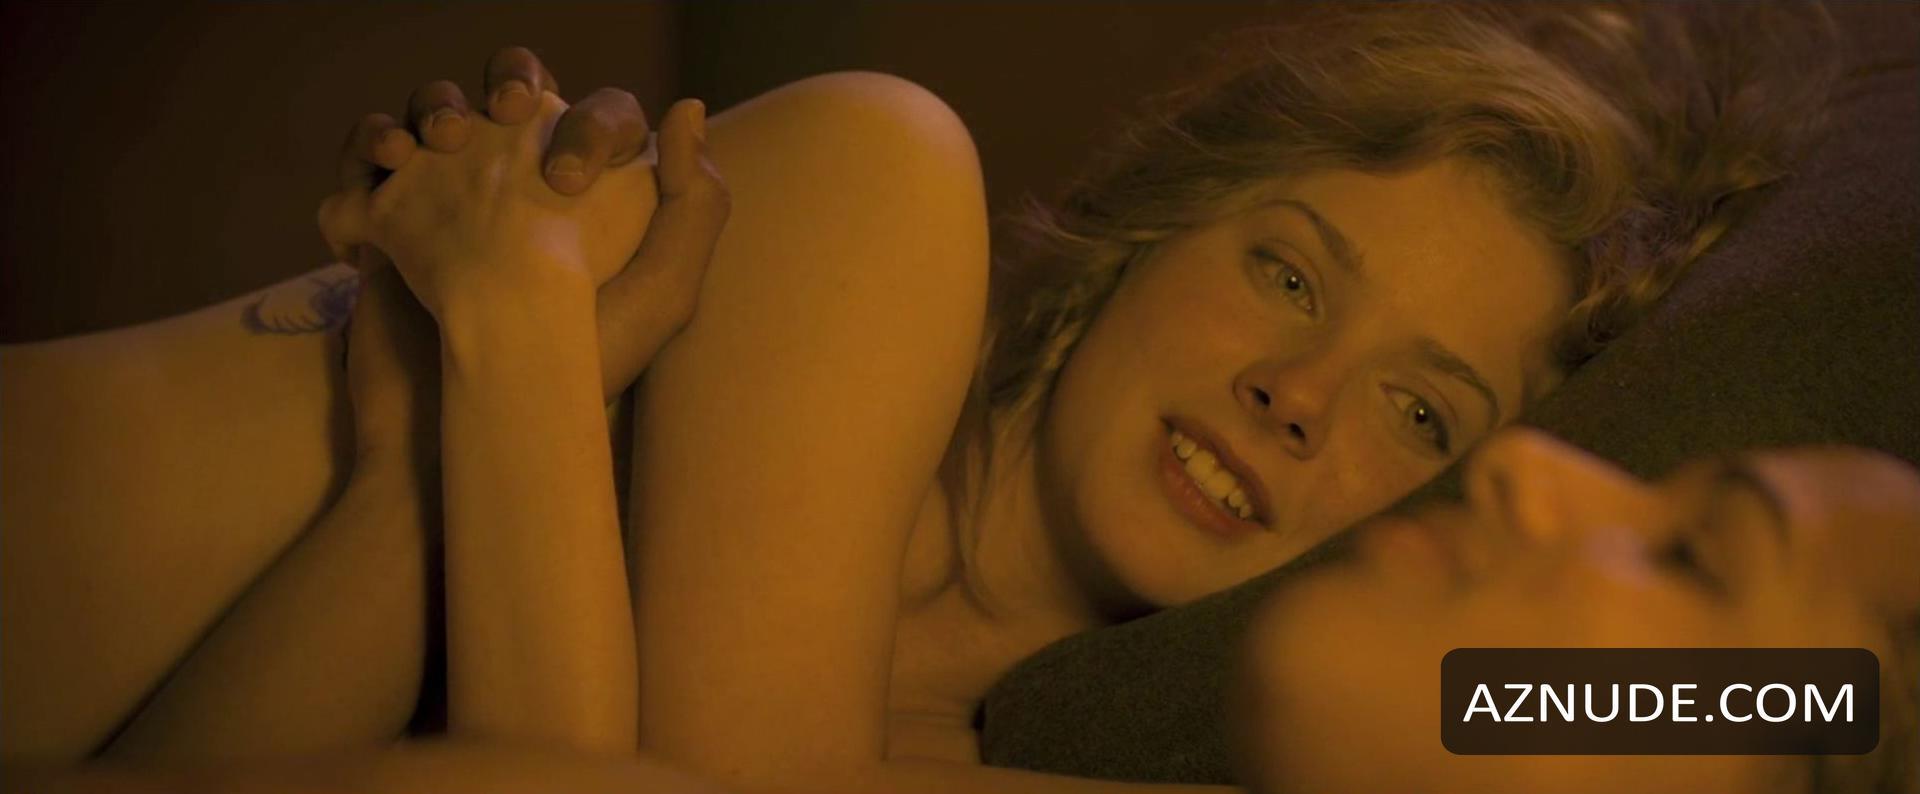 Wwe Sexy Nude Divas